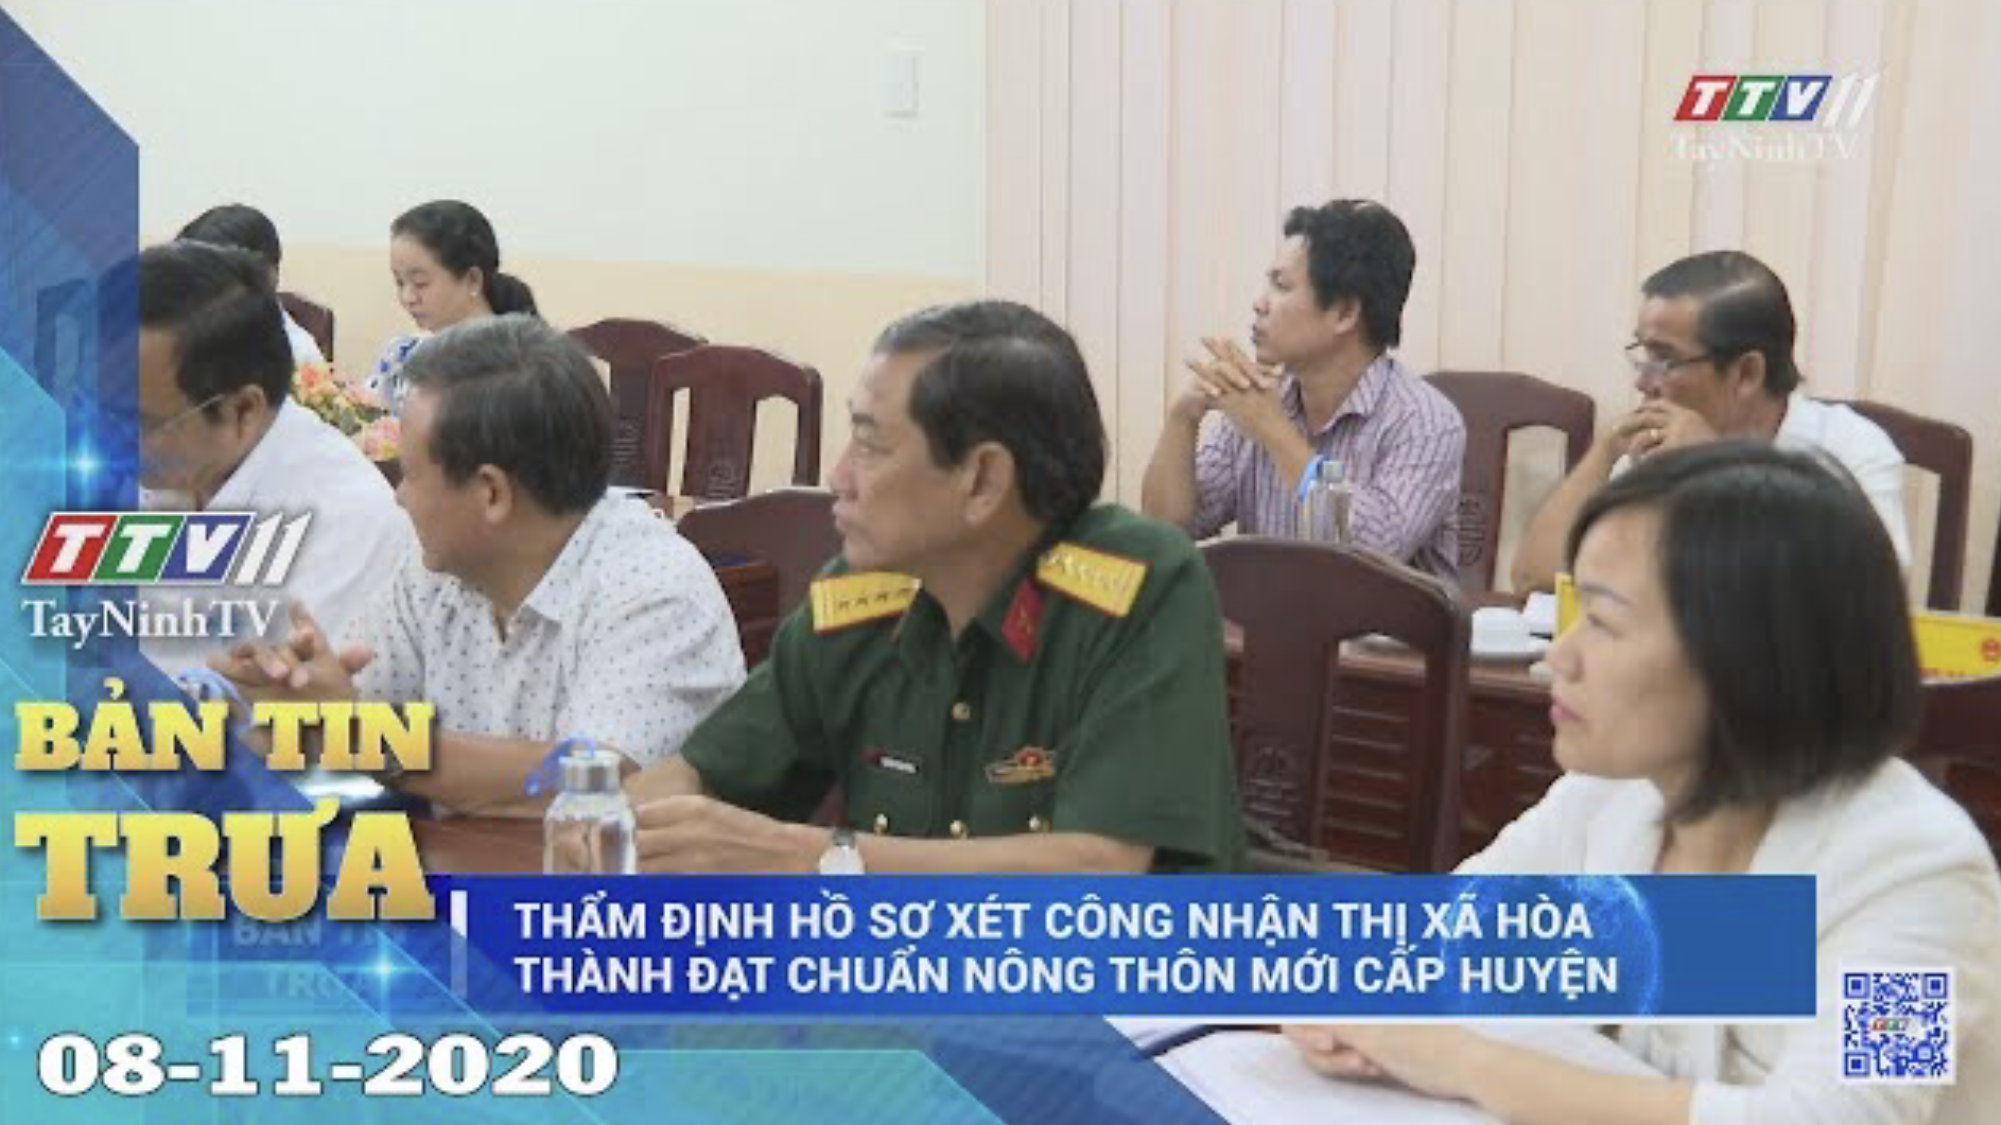 Bản tin trưa 08-11-2020 | Tin tức hôm nay | TayNinhTV